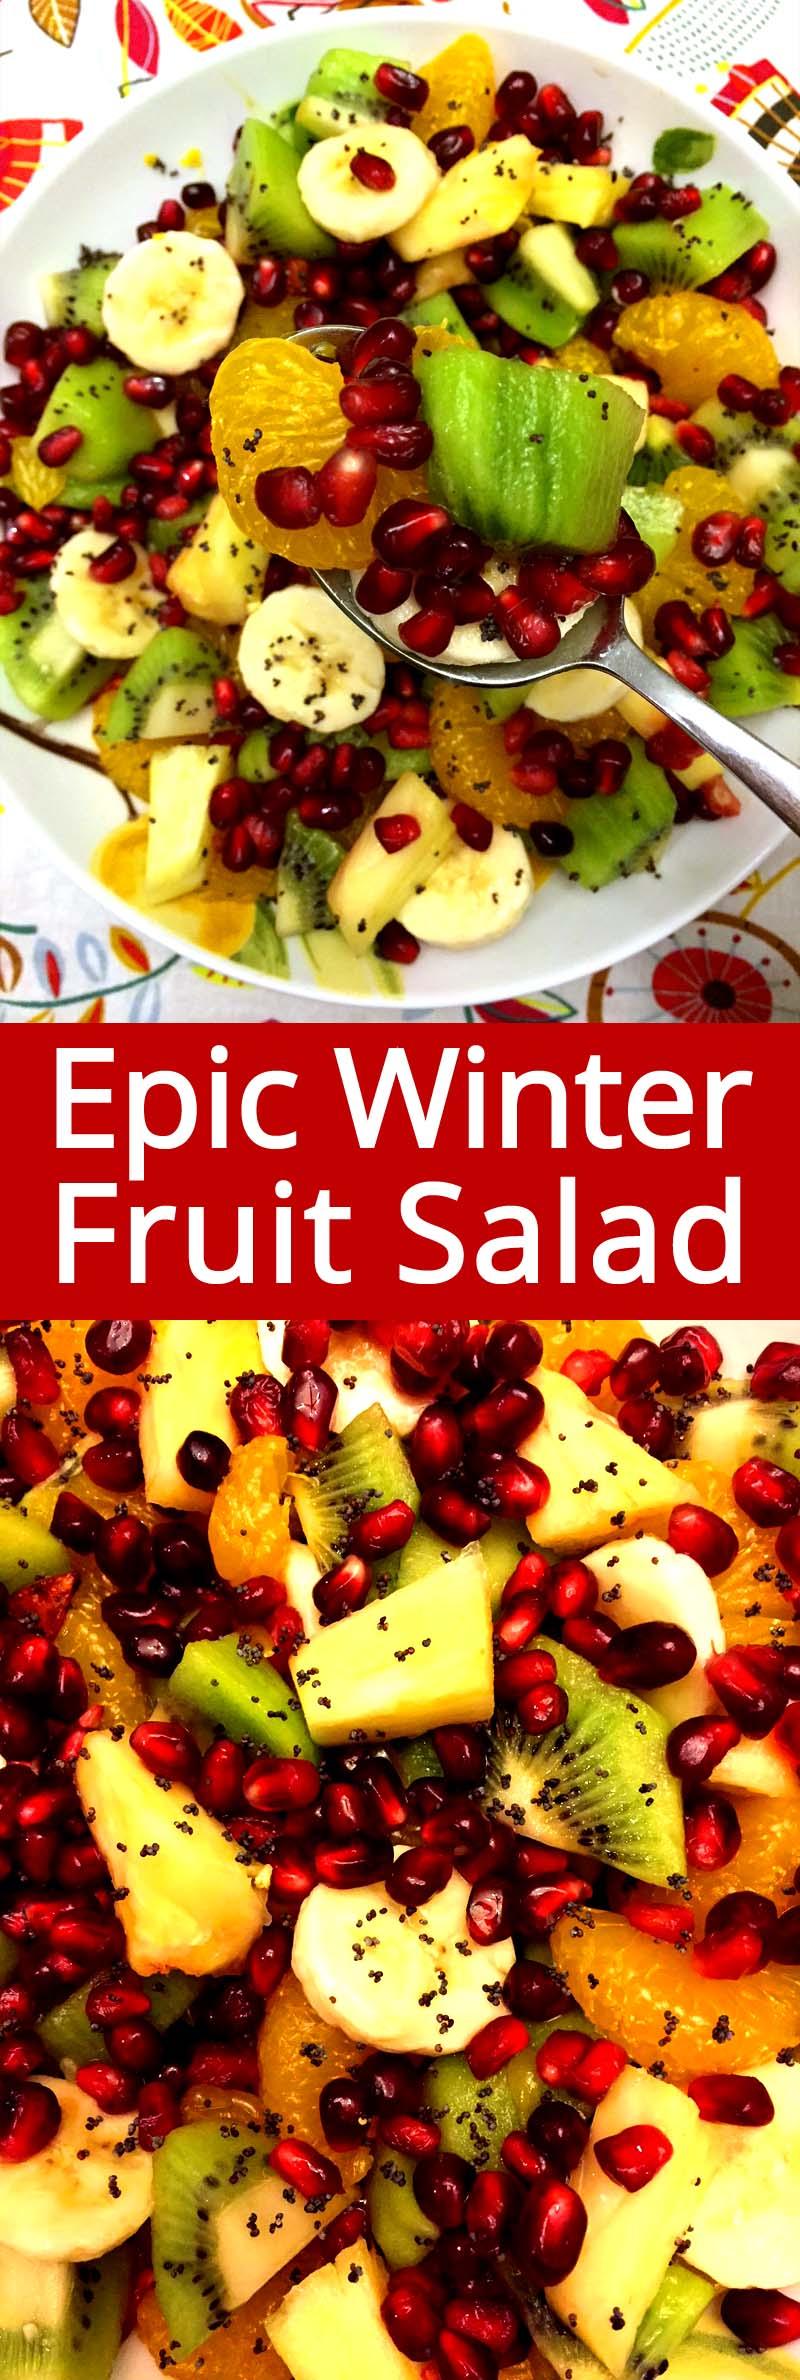 Pomegranate Winter Fruit Salad Recipe Easy And Festive